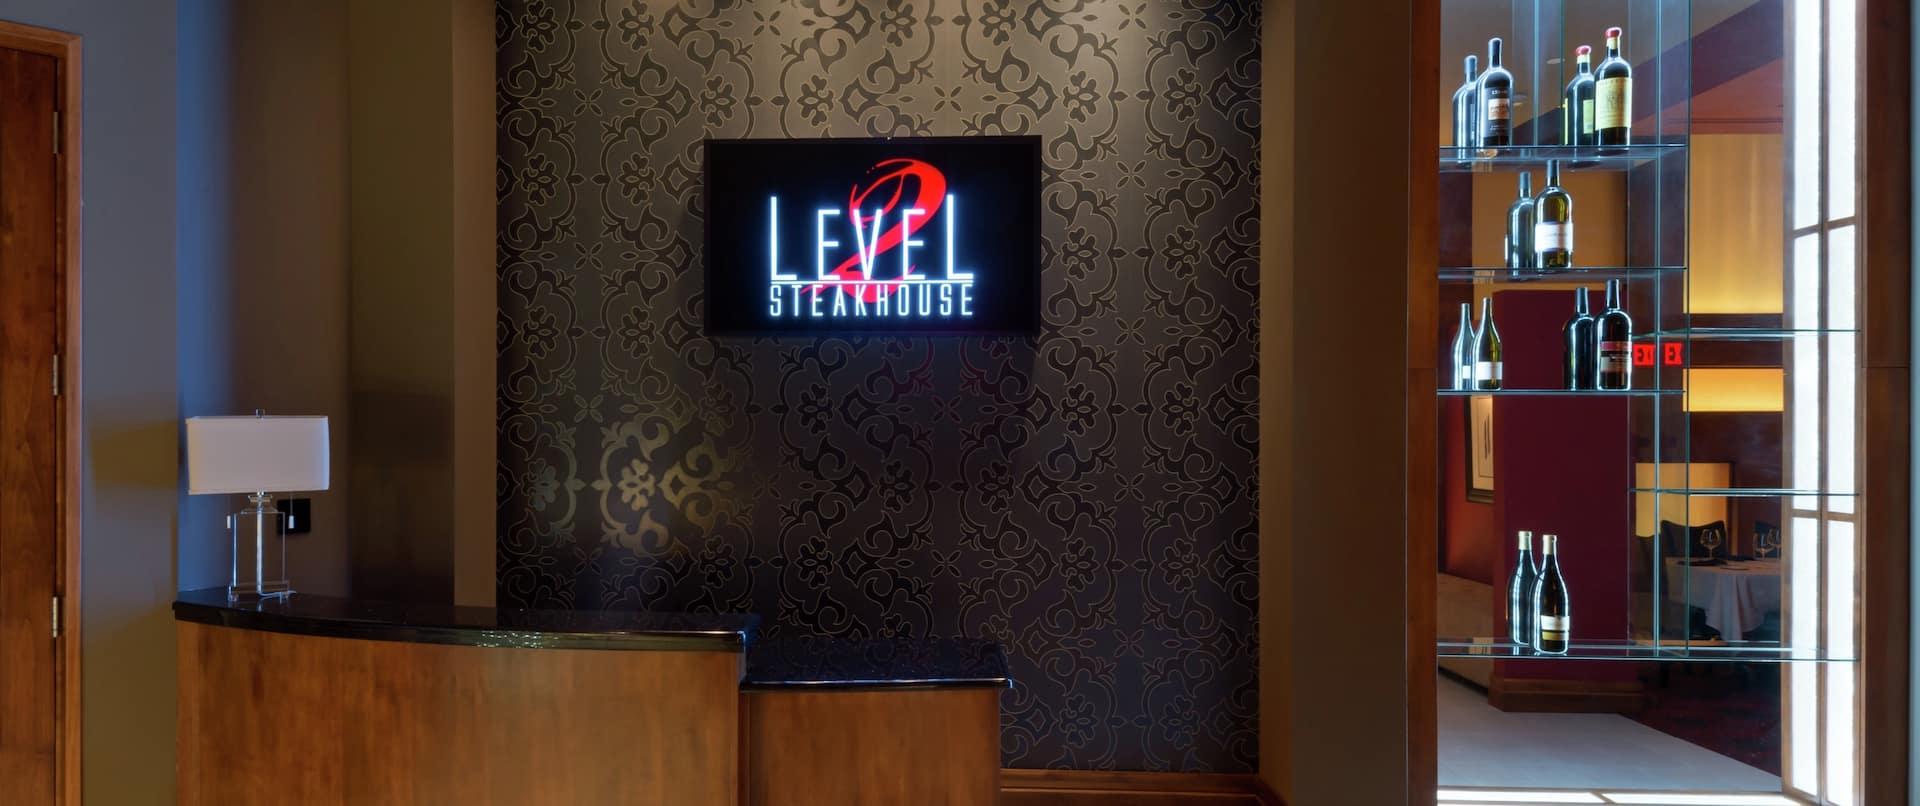 Level 2 Steakhouse Reception